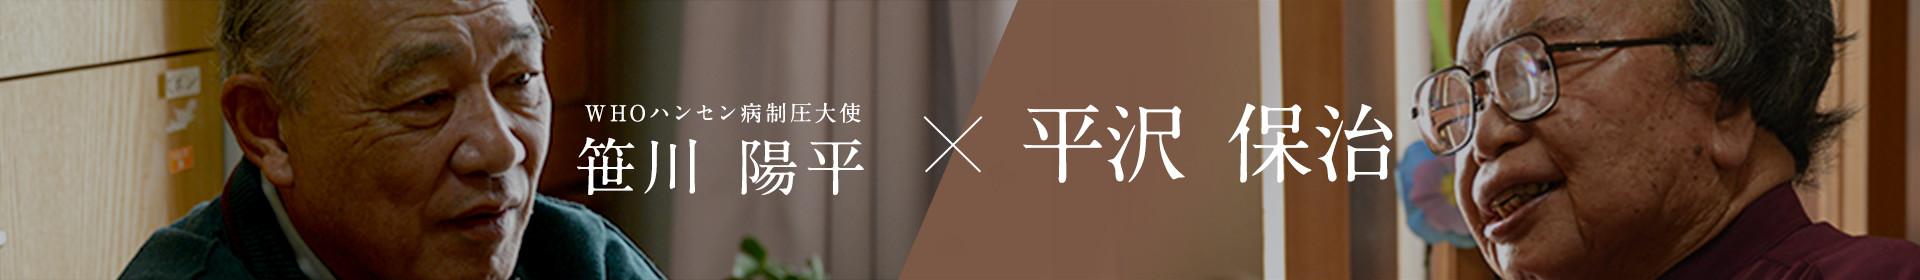 WHOハンセン病制圧大使 笹川 陽平 ✕ 平沢 保治